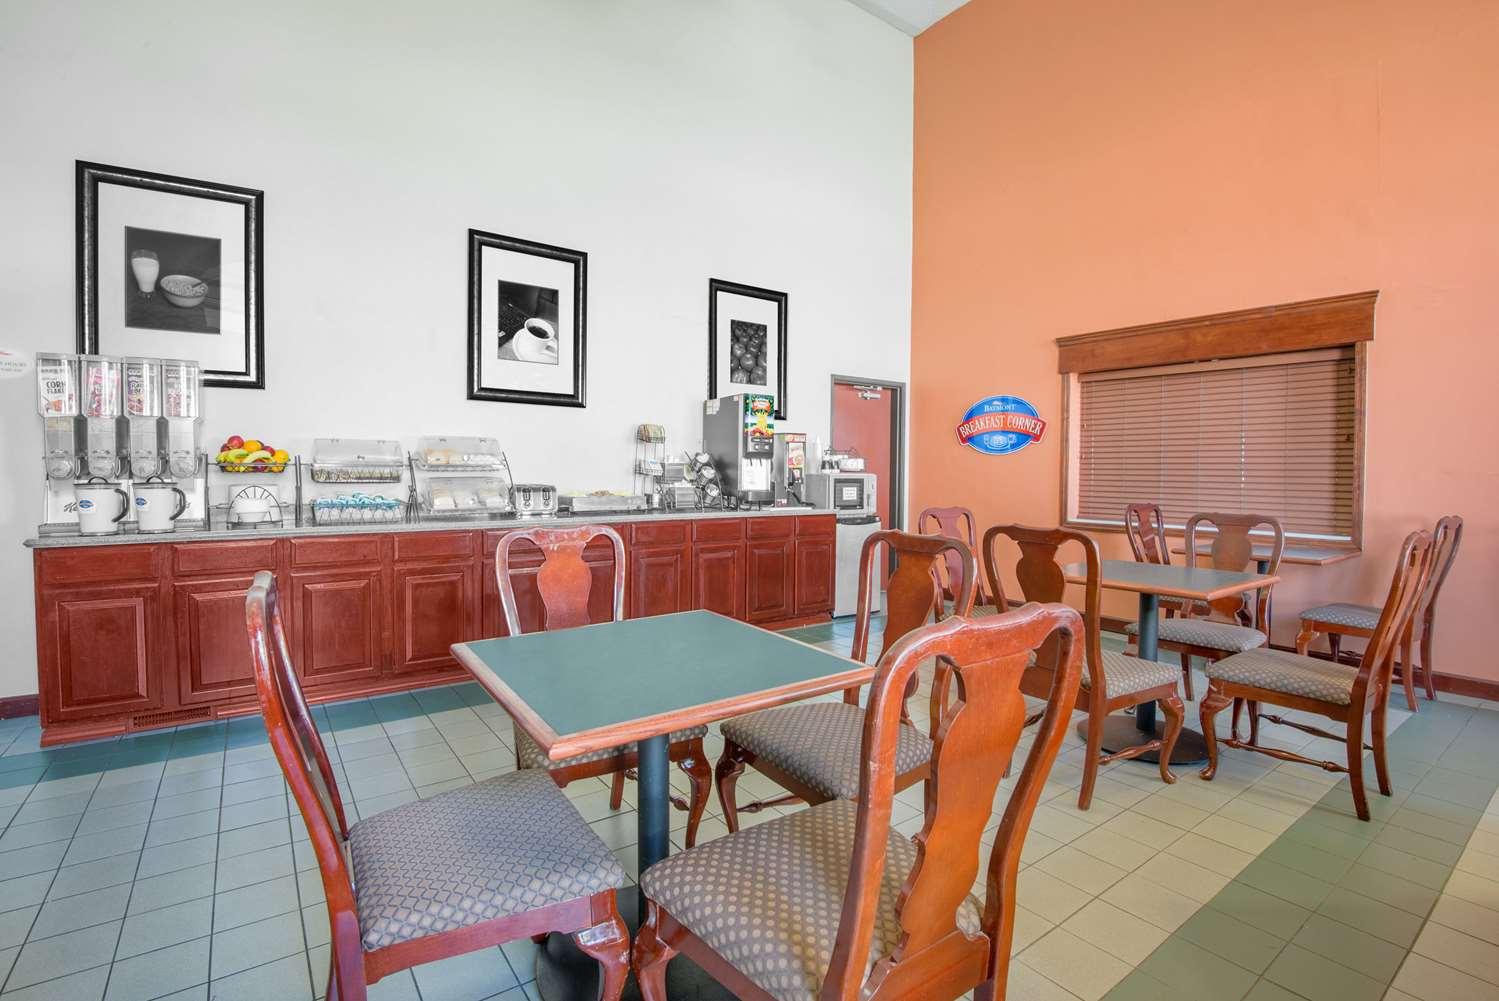 proam - Baymont Inn & Suites Hudson